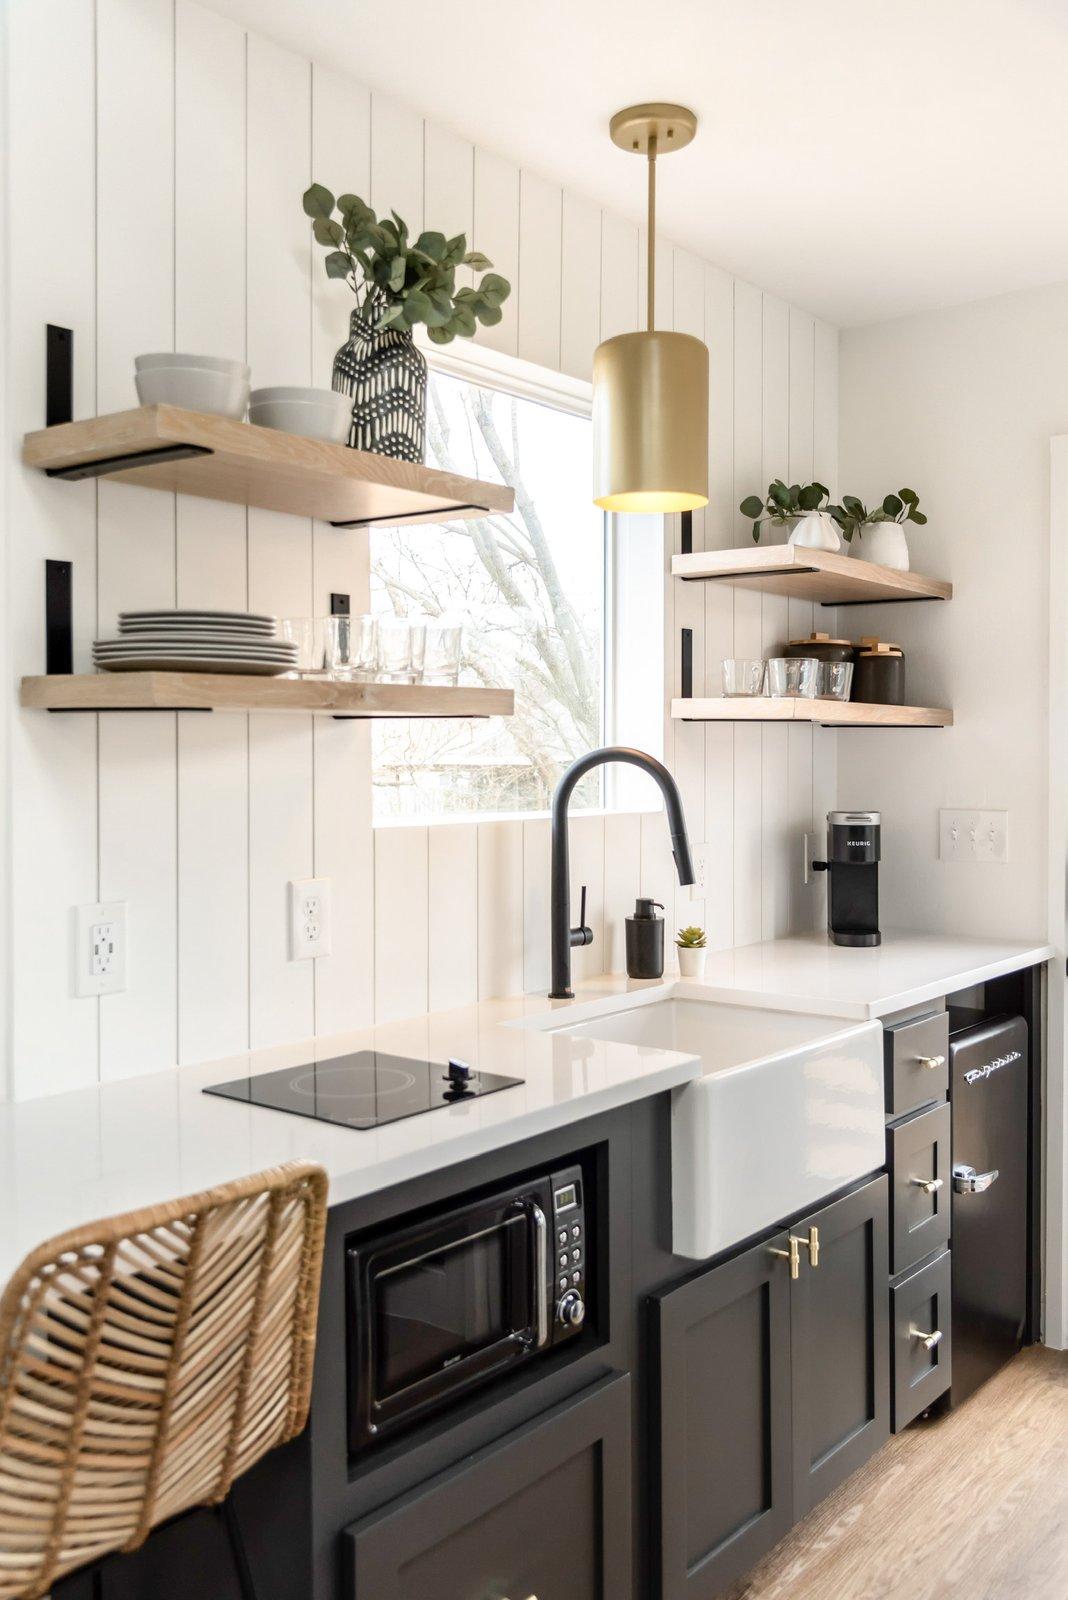 The Back House by Cedar & Oak kitchen